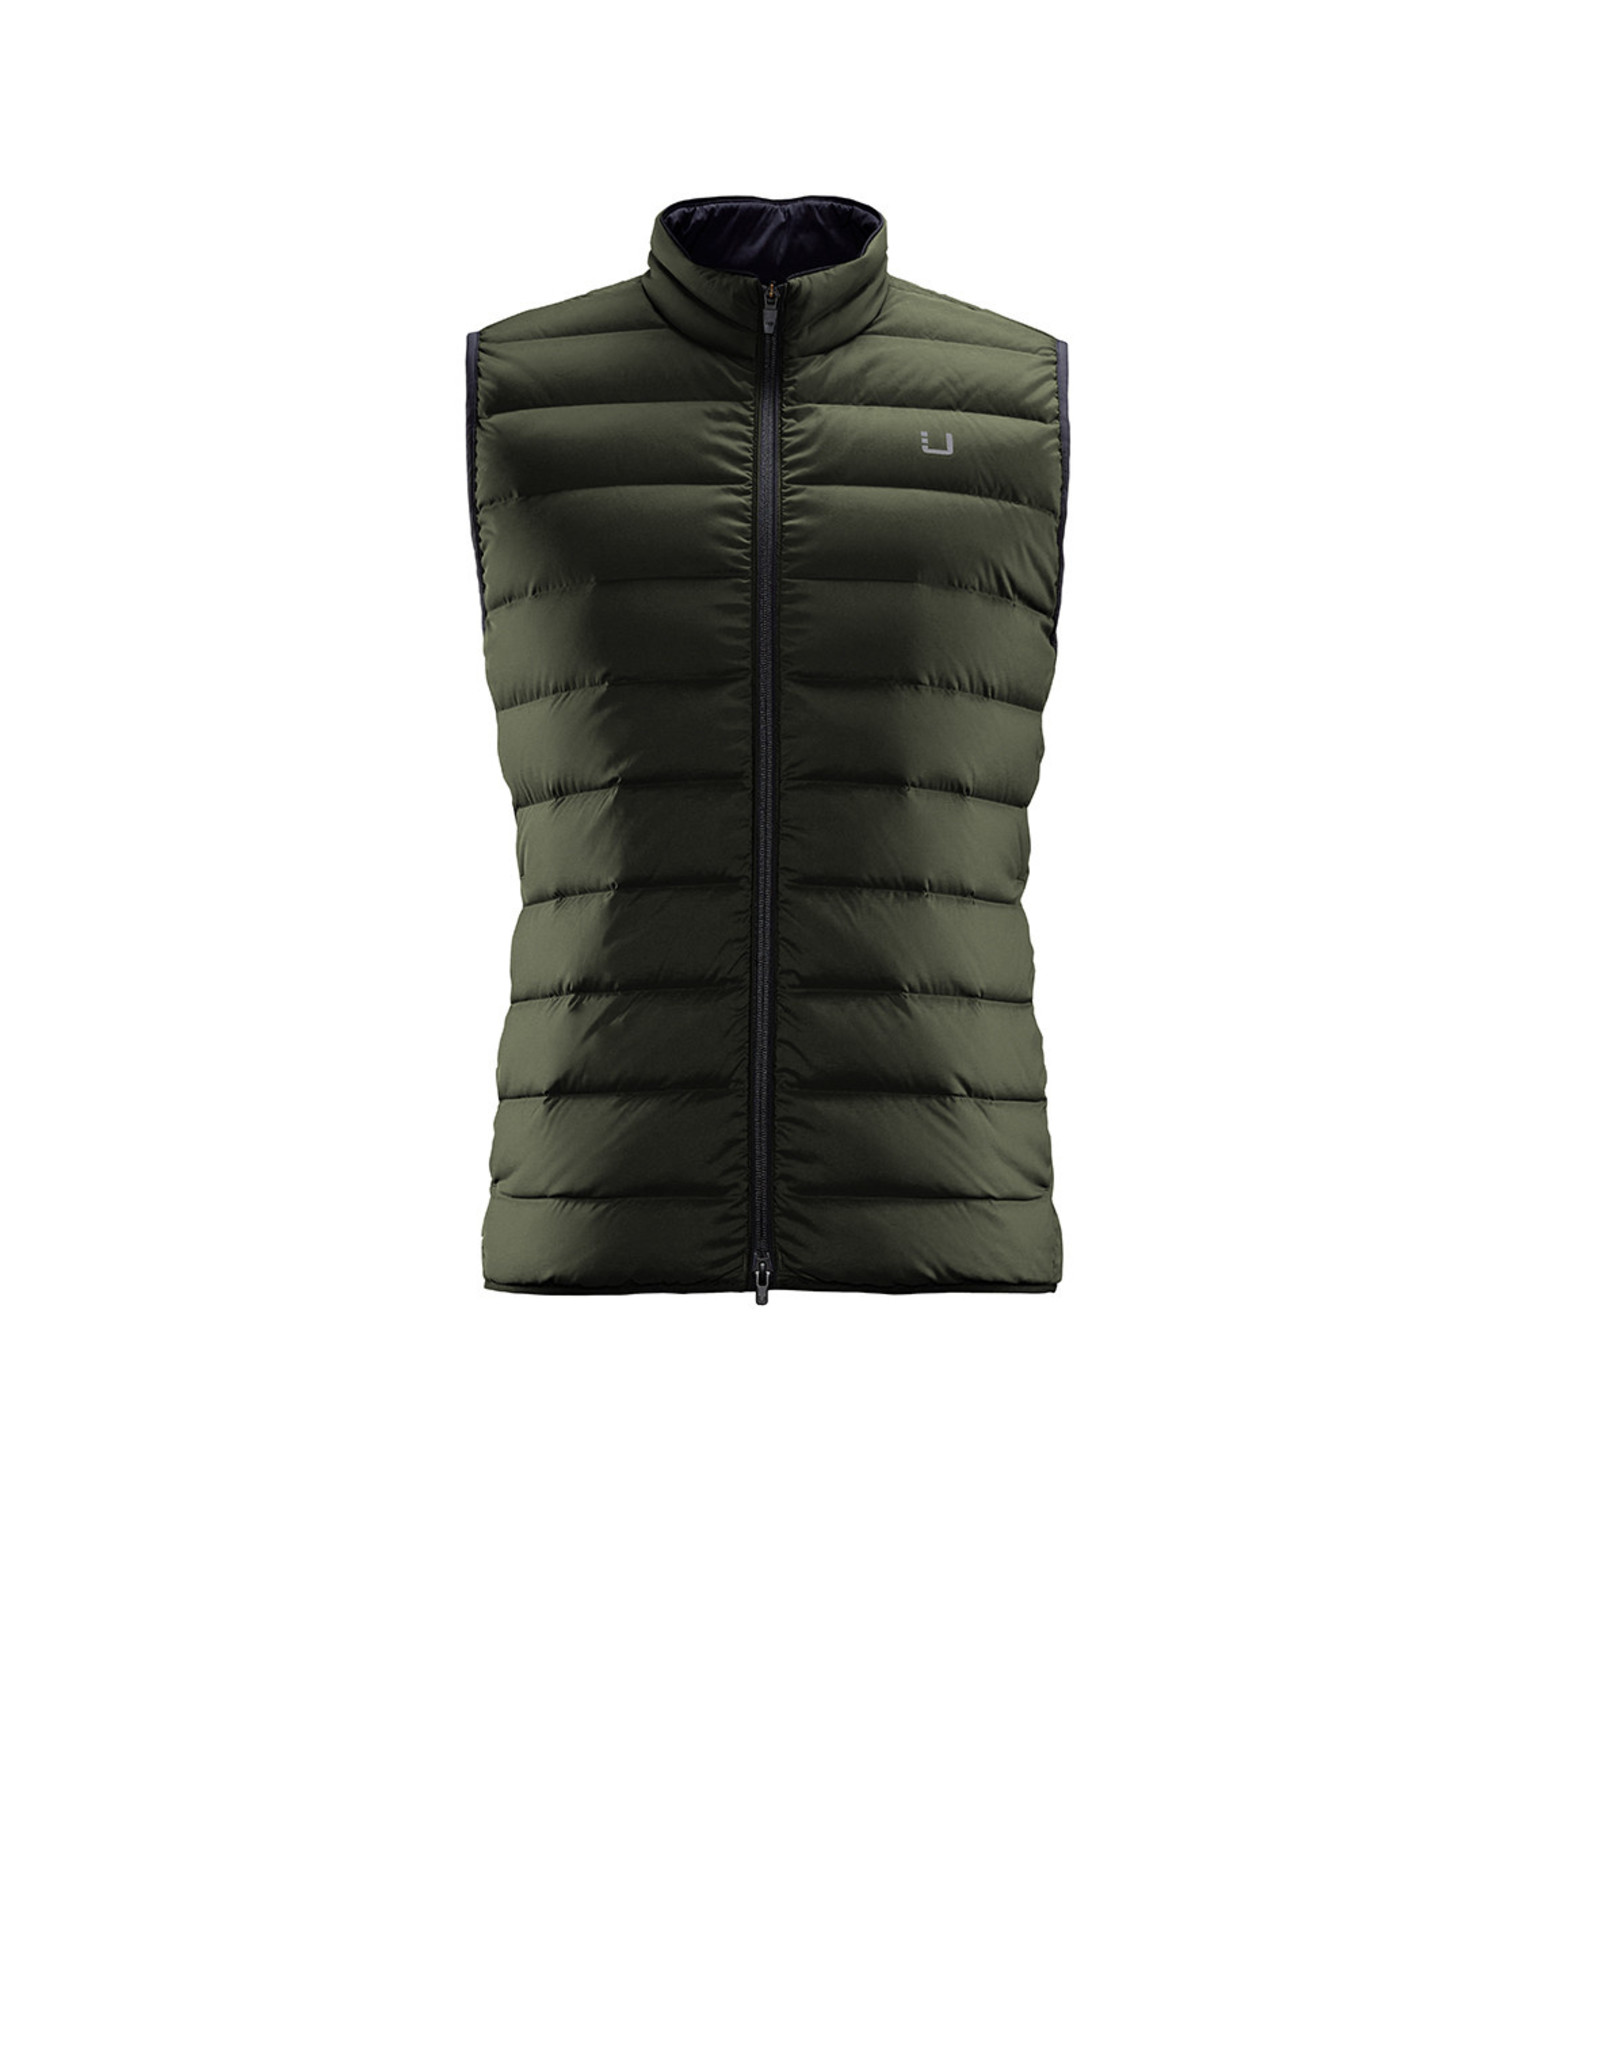 UBR UBR bodywarmer Sonic vest night olive